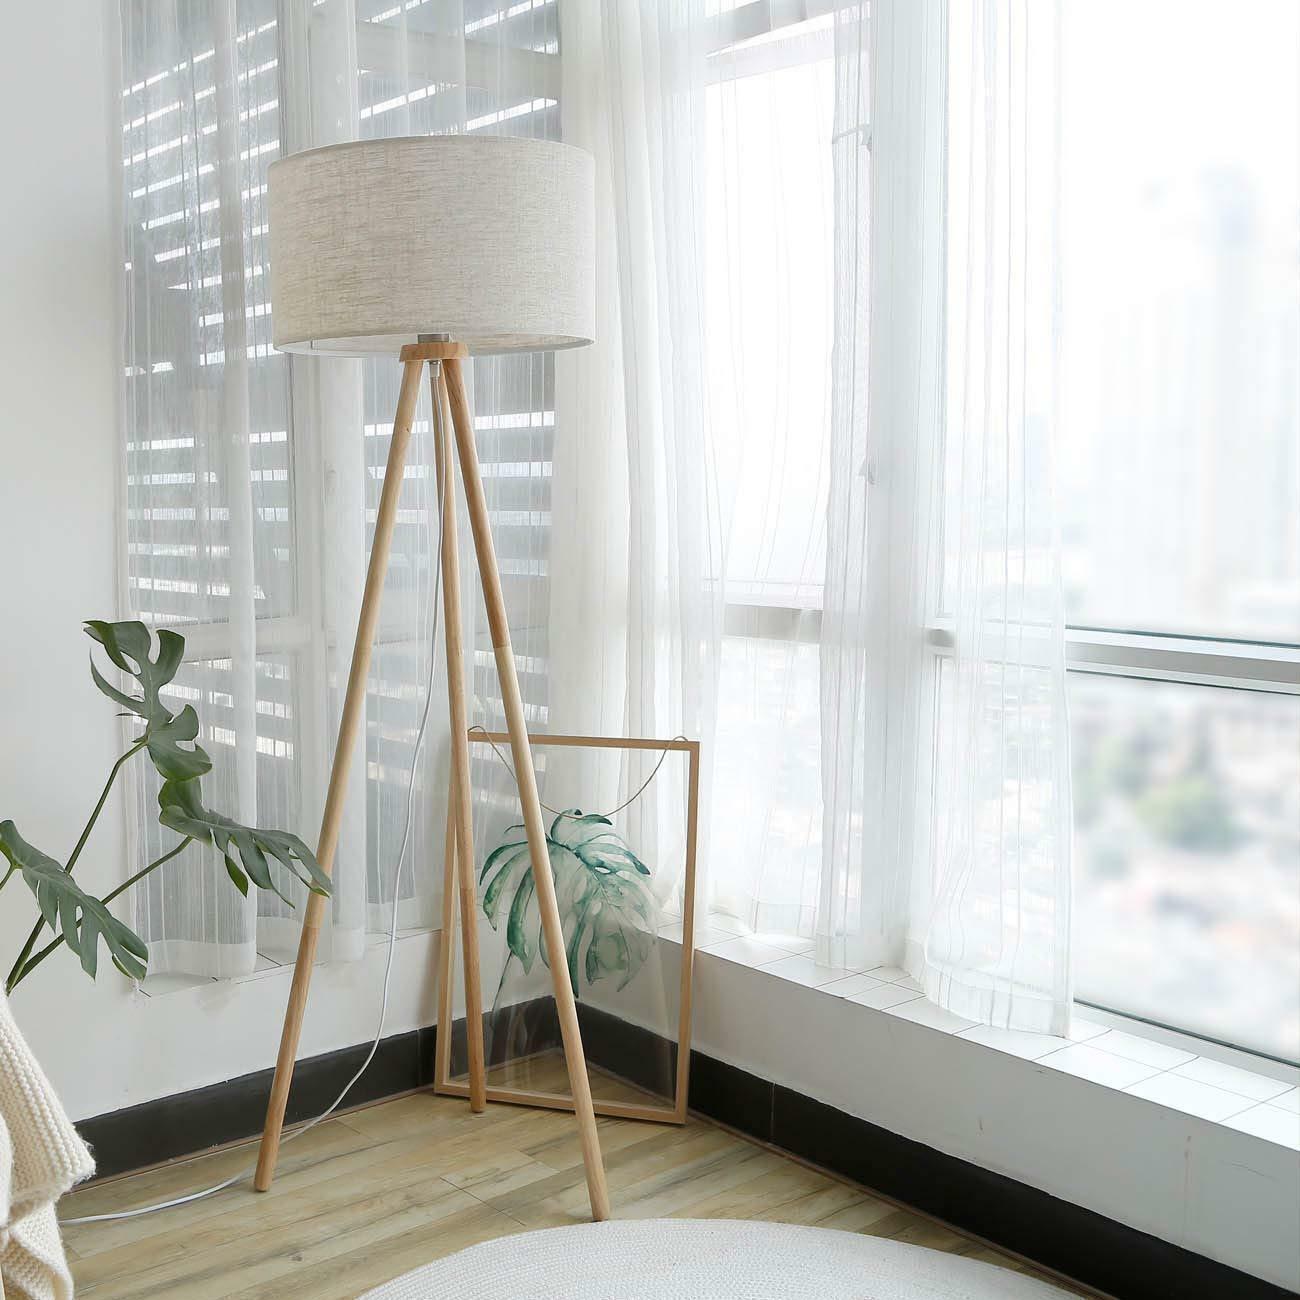 Stehlampe Schlafzimmer Holz